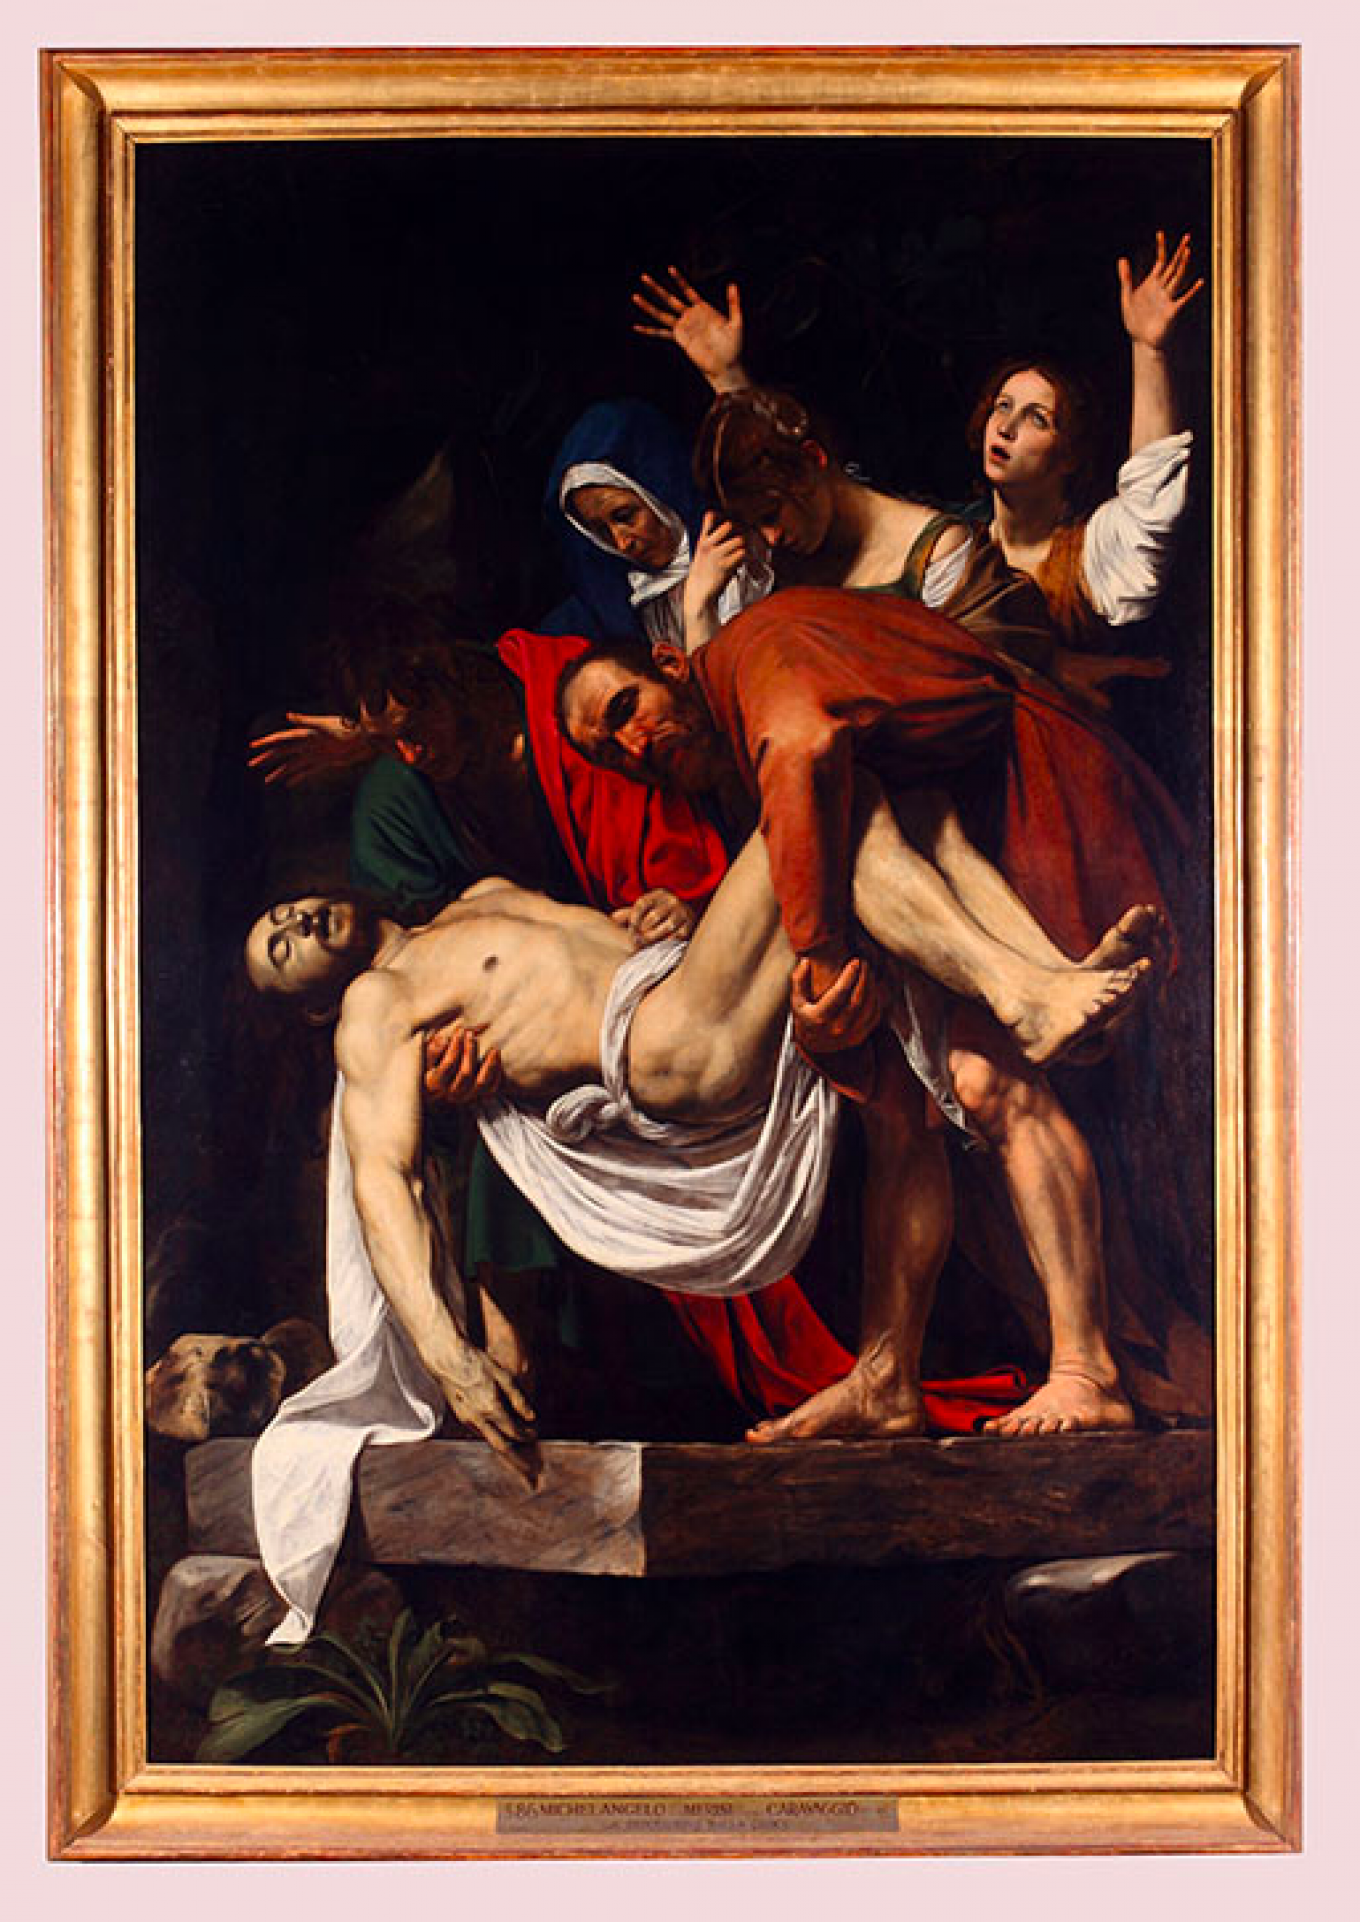 """The Deposition"" by Caravaggio (1603-1604) Tretyakov Gallery"